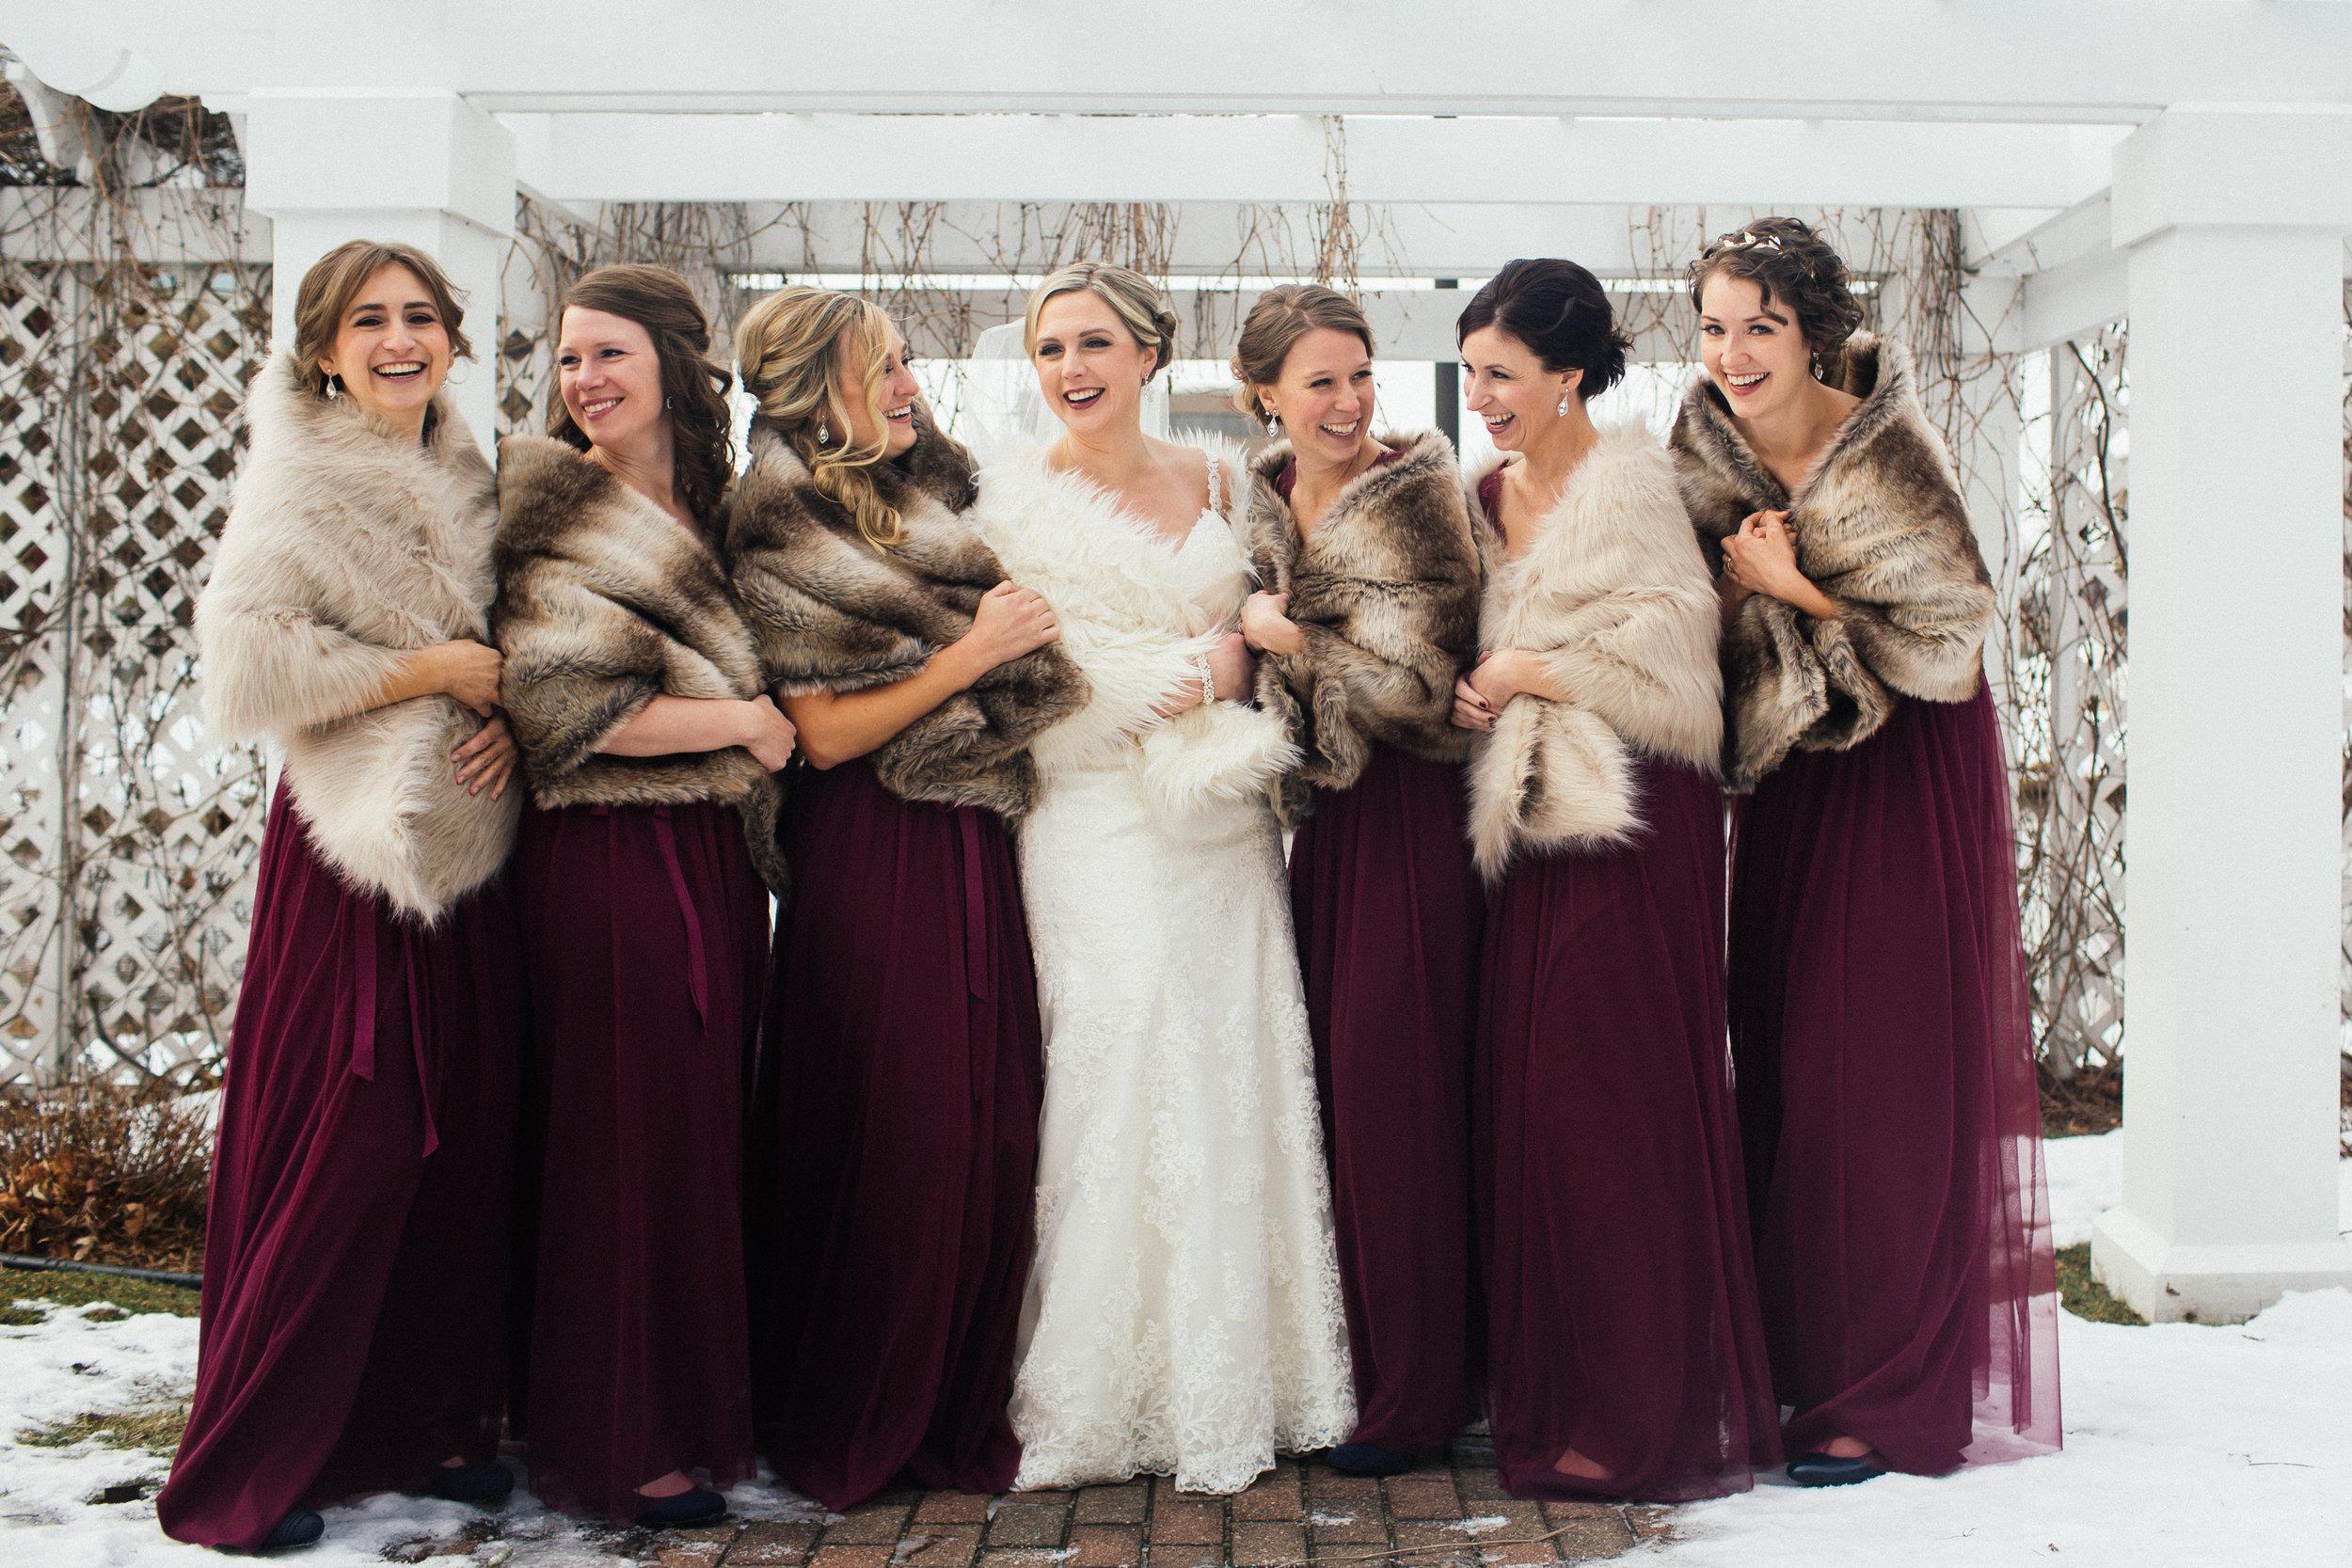 Earle Brown Heritage Center Bride